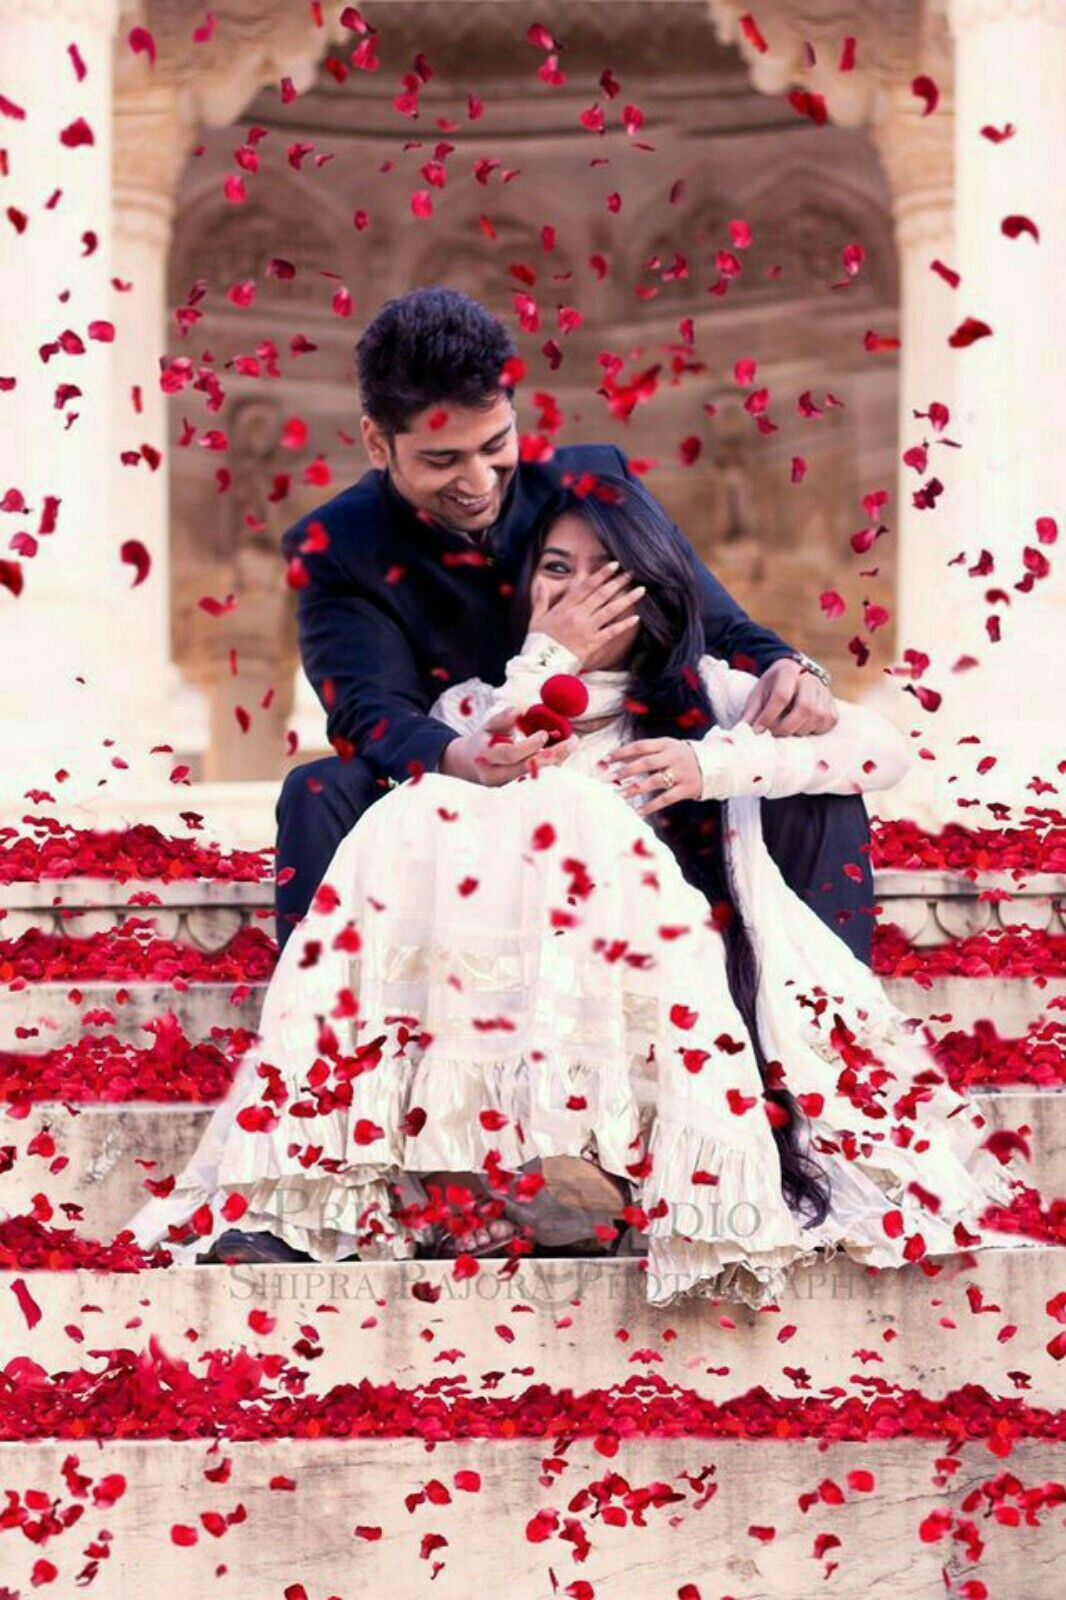 Pin by Farzana on Ek Din | Indian wedding photography